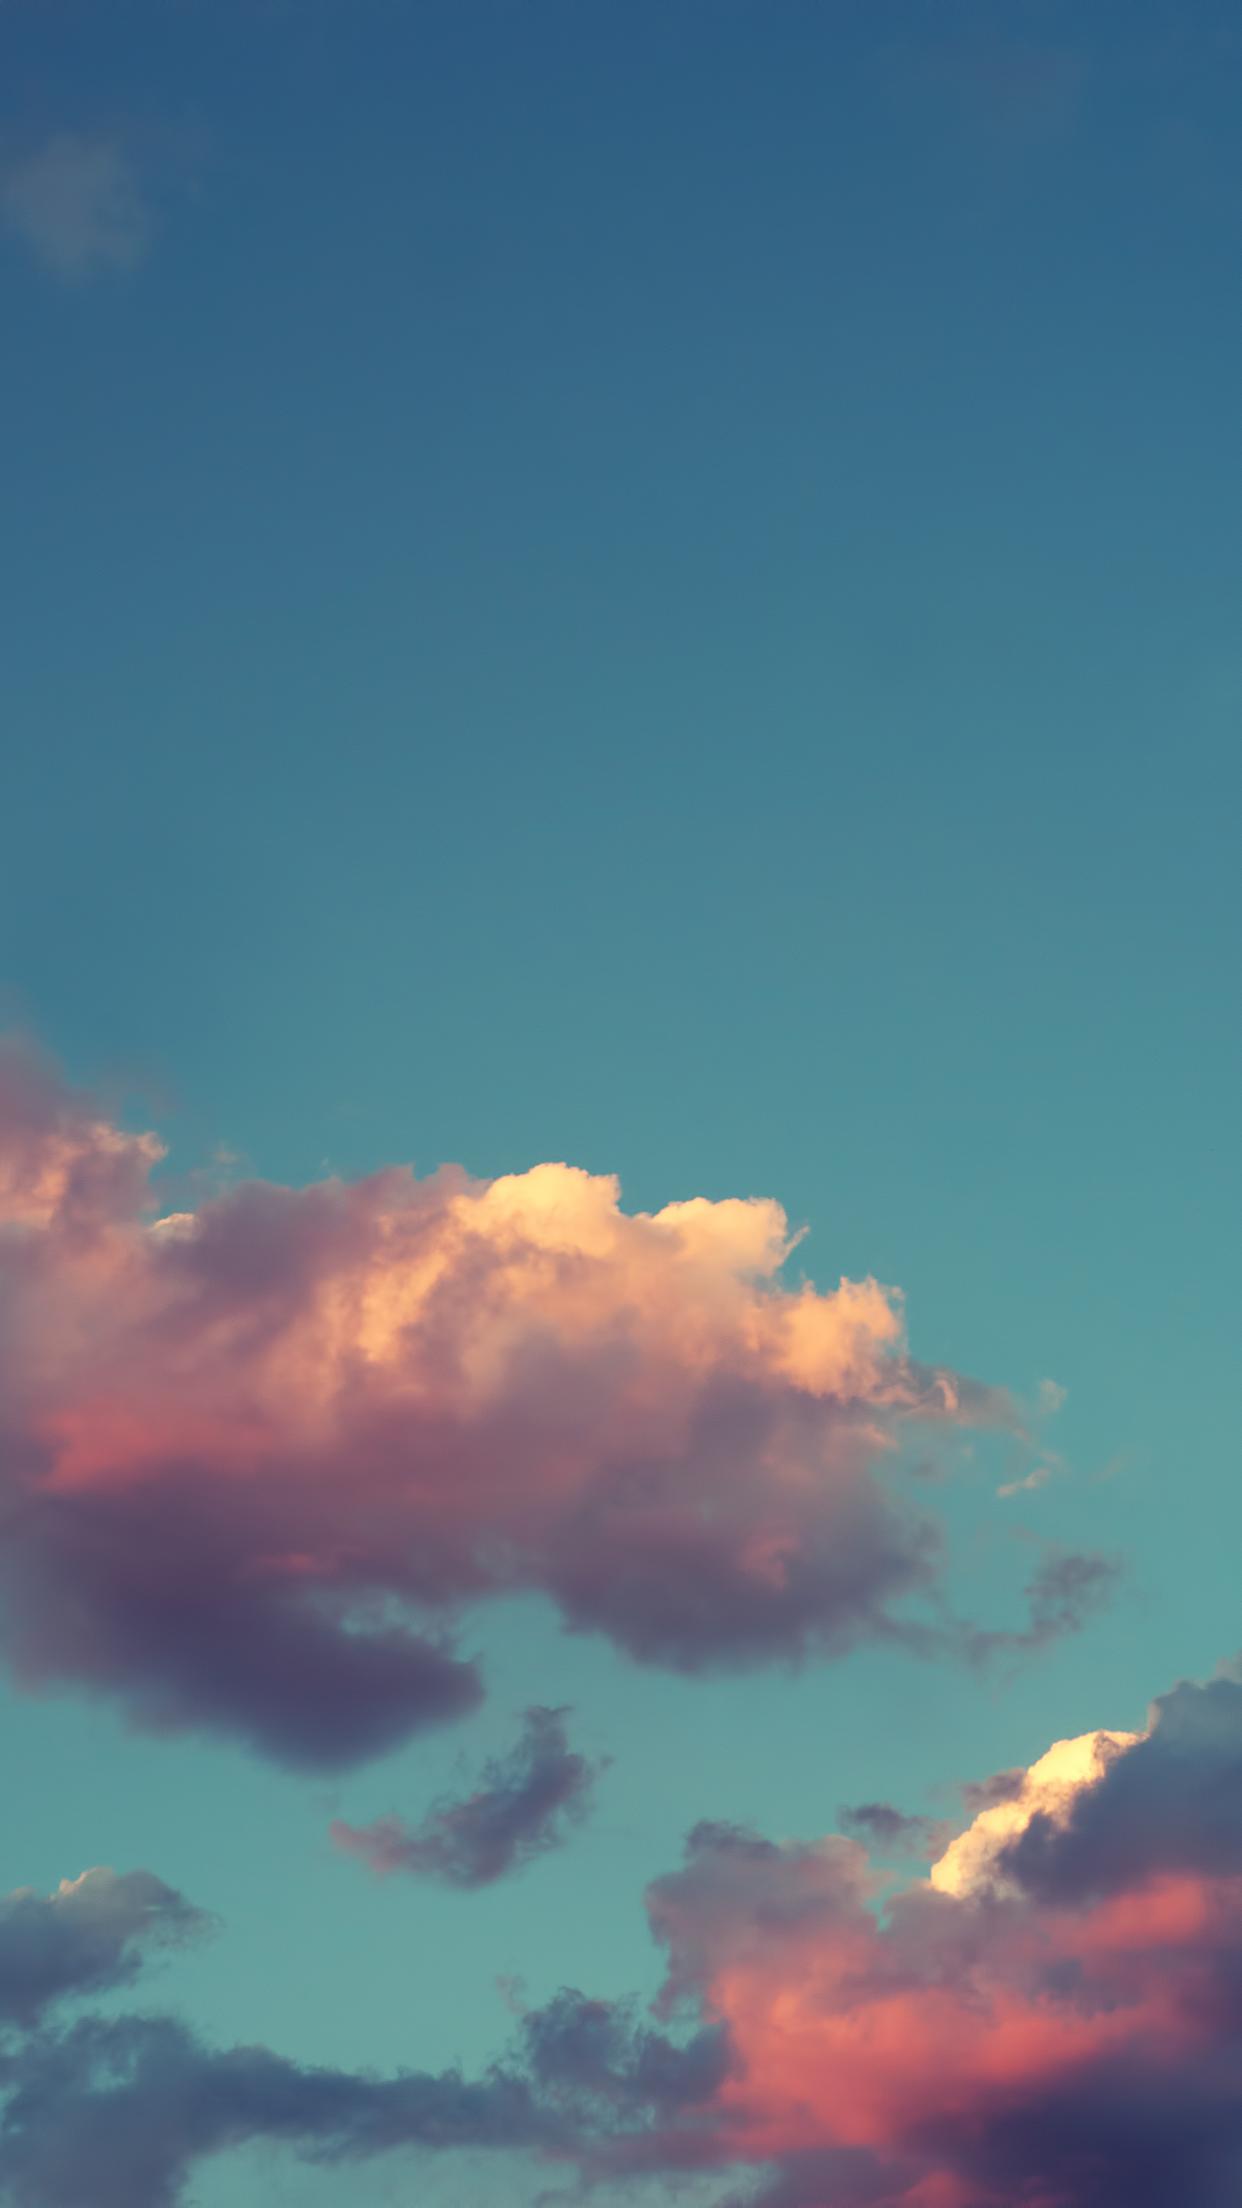 Cute Rose Wallpaper Free Download Clouds Iphone Wallpapers Pixelstalk Net